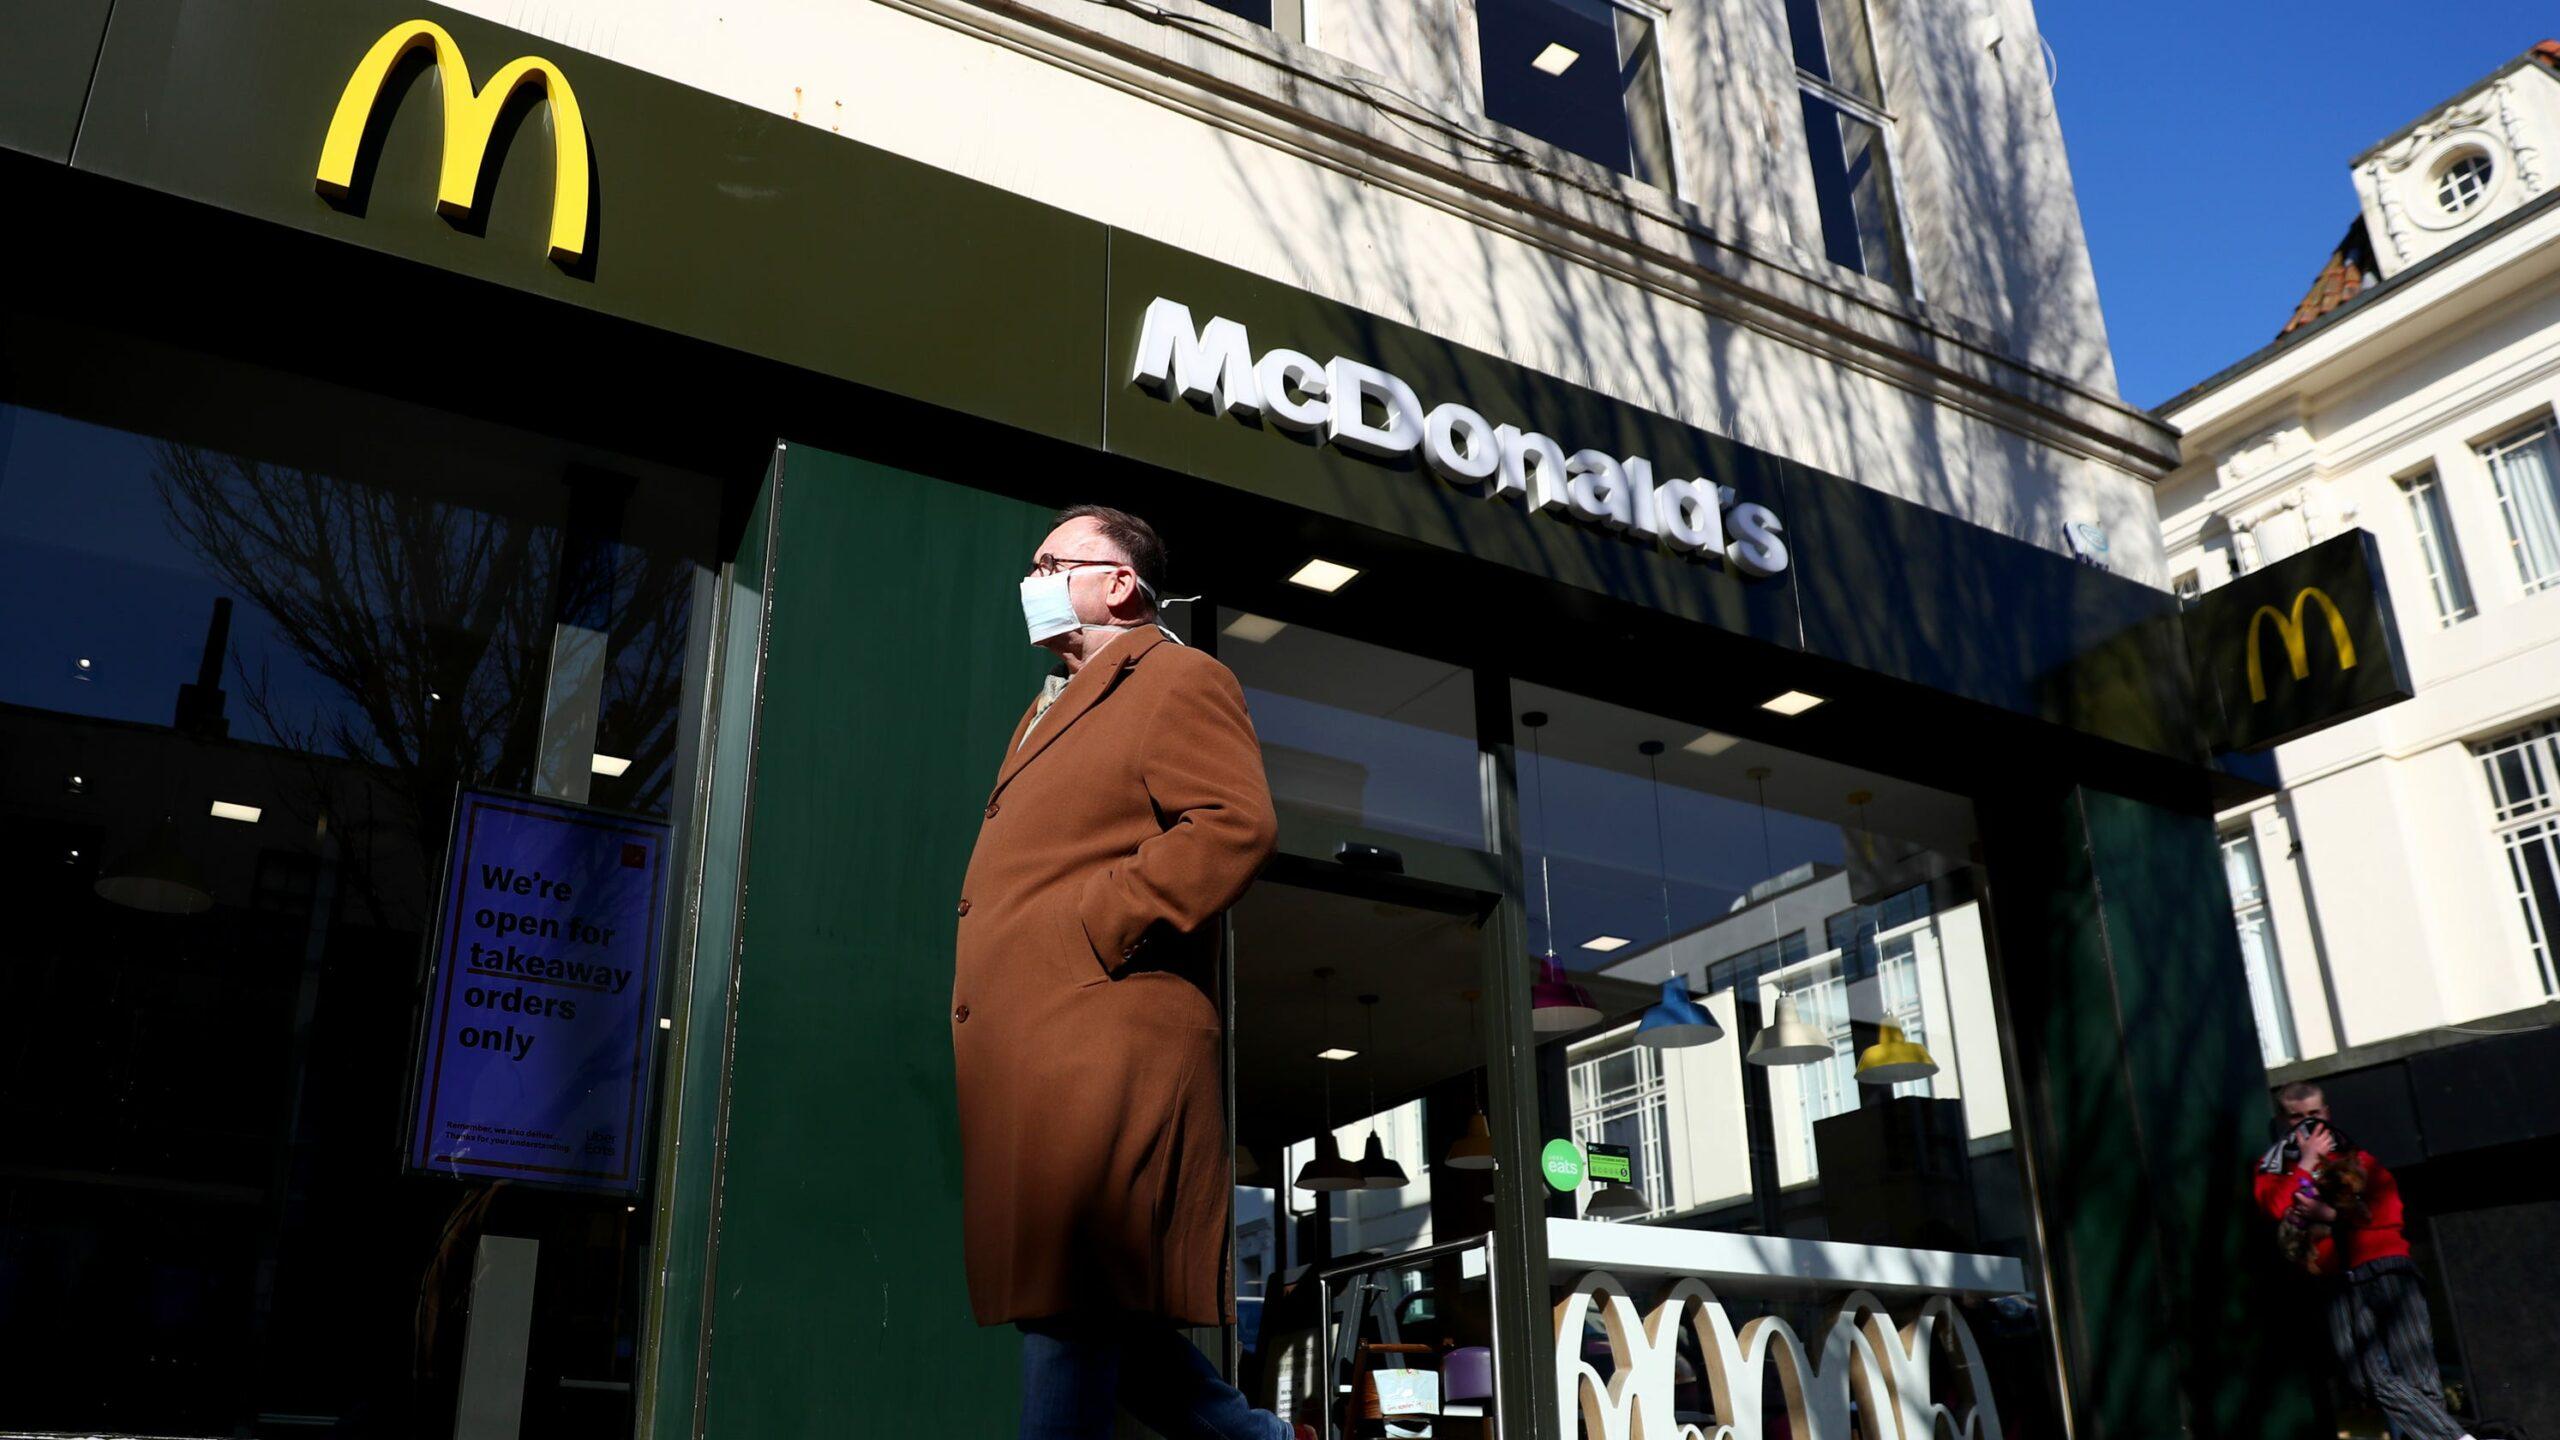 McDonald's pulls all-day breakfast menu to 'simplify operations' amid coronavirus pandemic